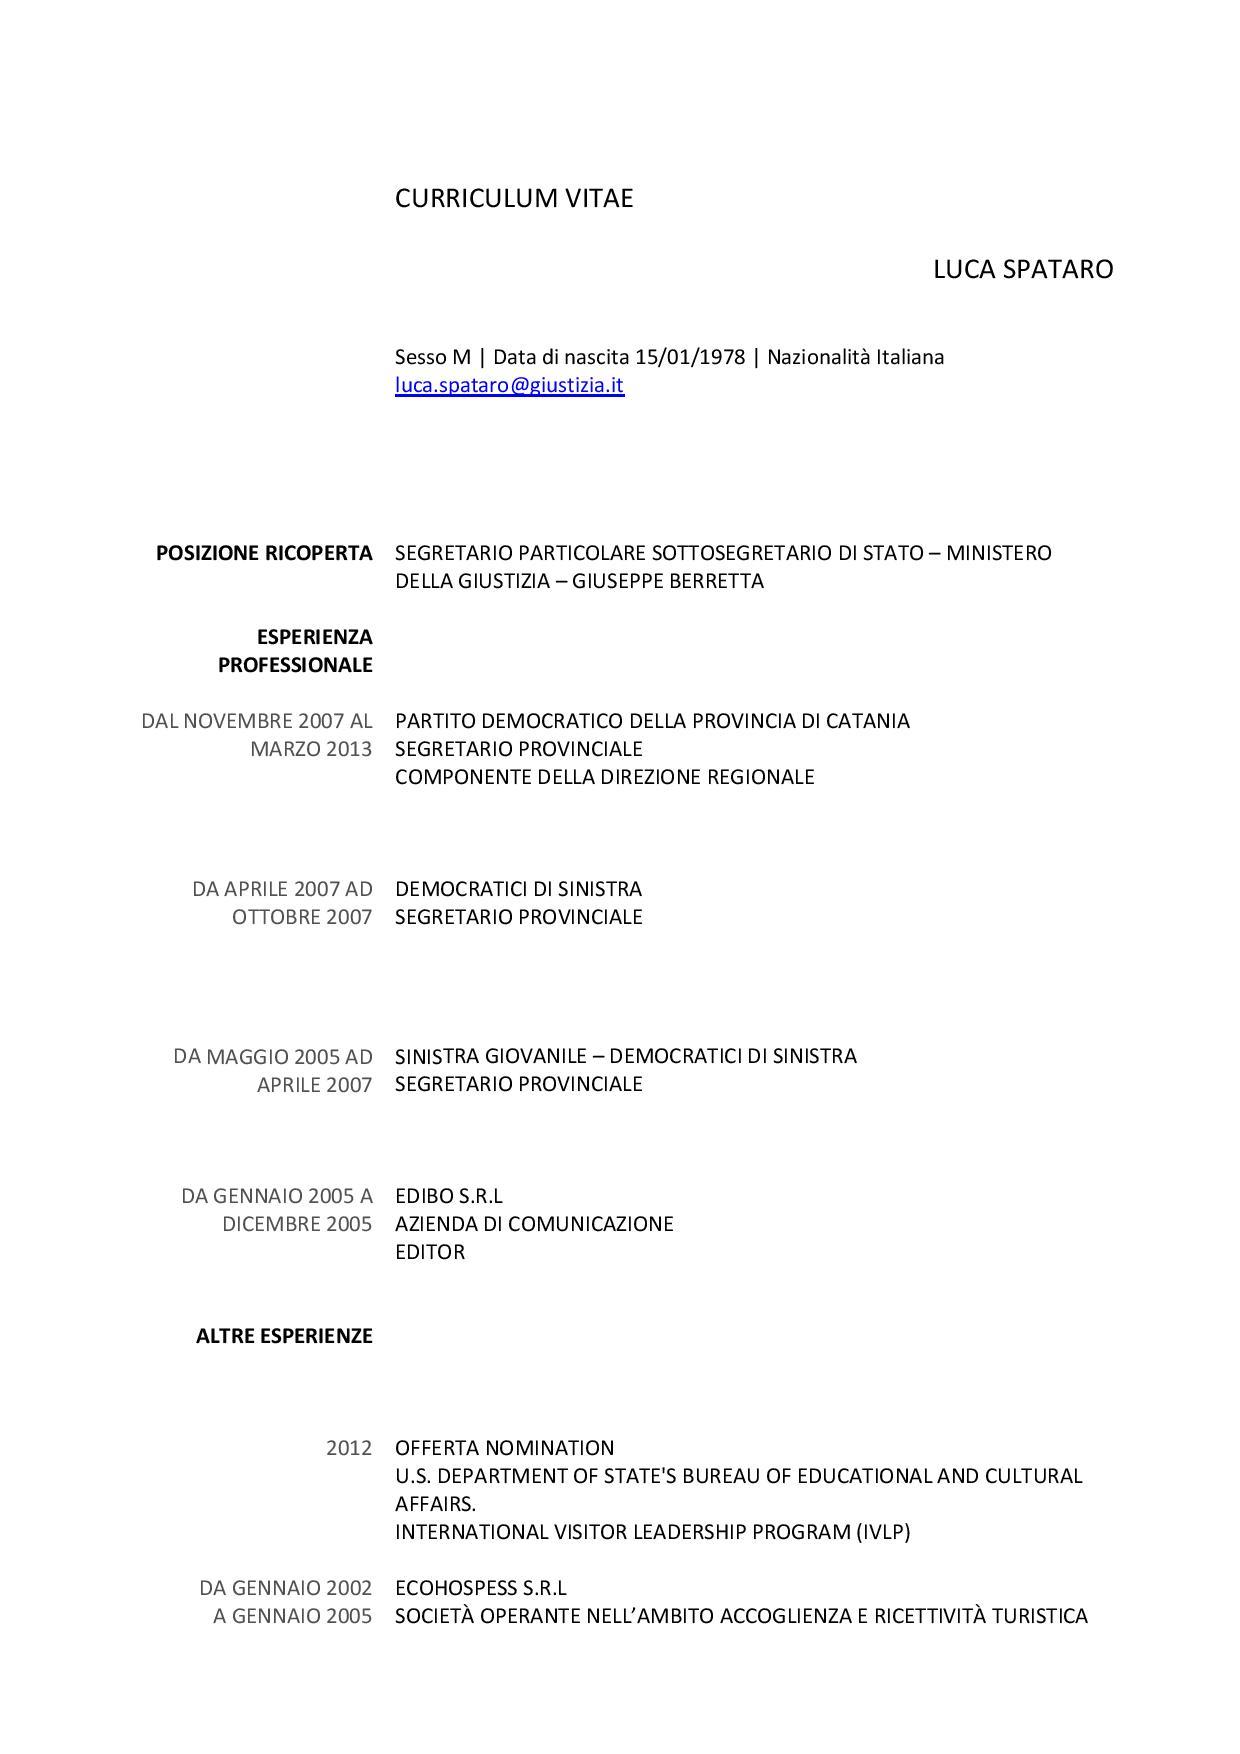 cv_SpataroLuca-page-001